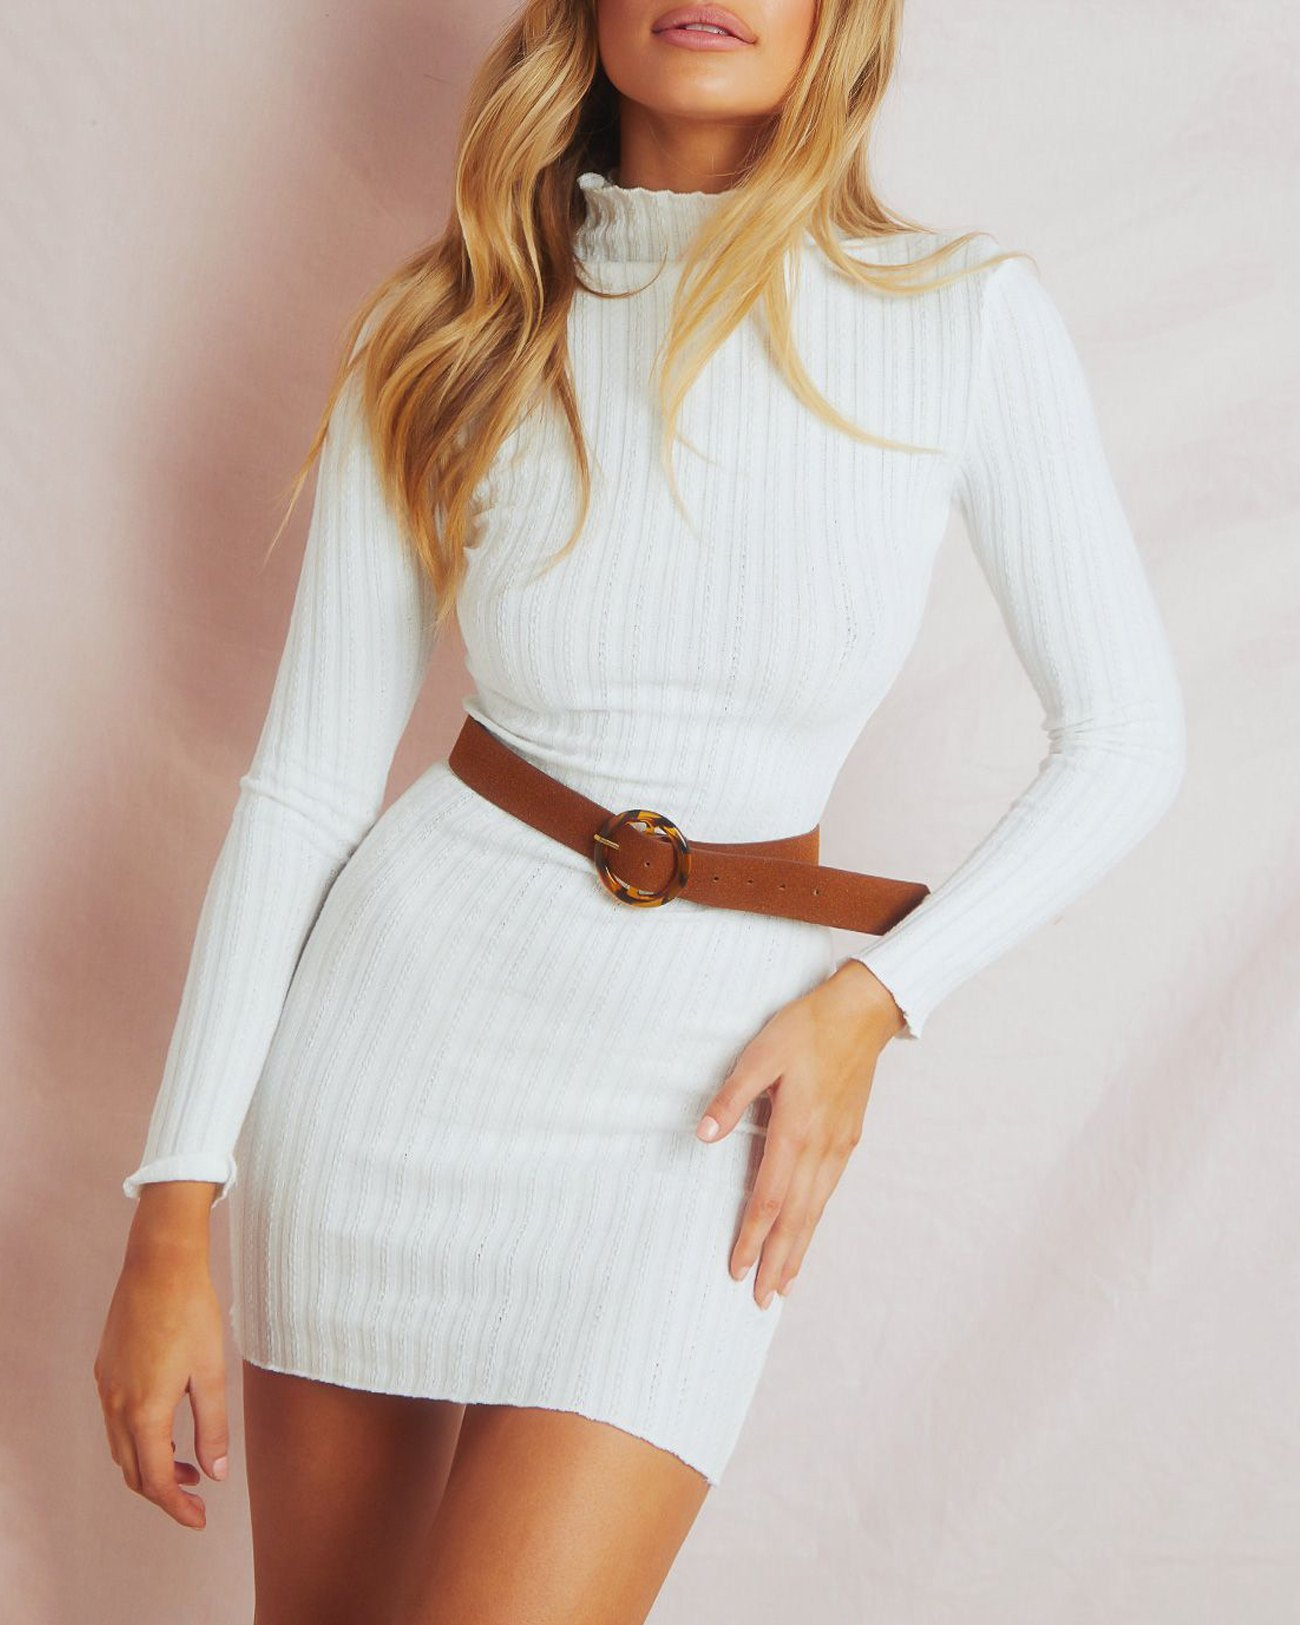 Wave Neck Rib-knit Dress - White S